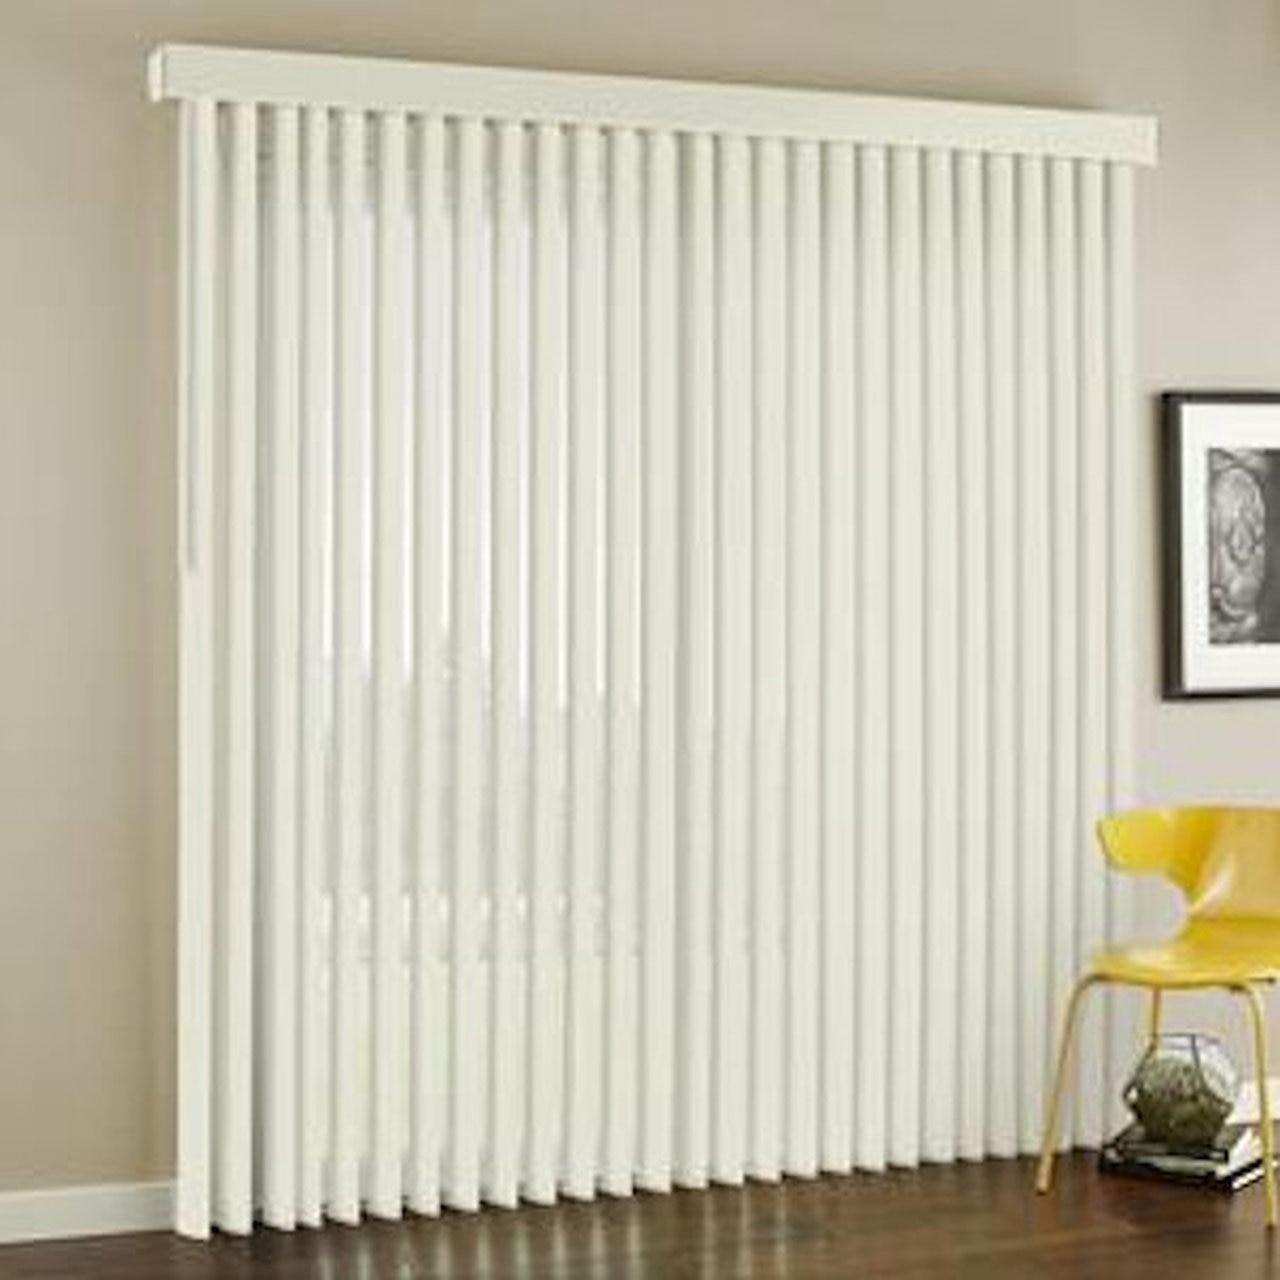 "3-1/2 in PVC Vertical Blinds in White 95"" x 60"" - GotSurpl"